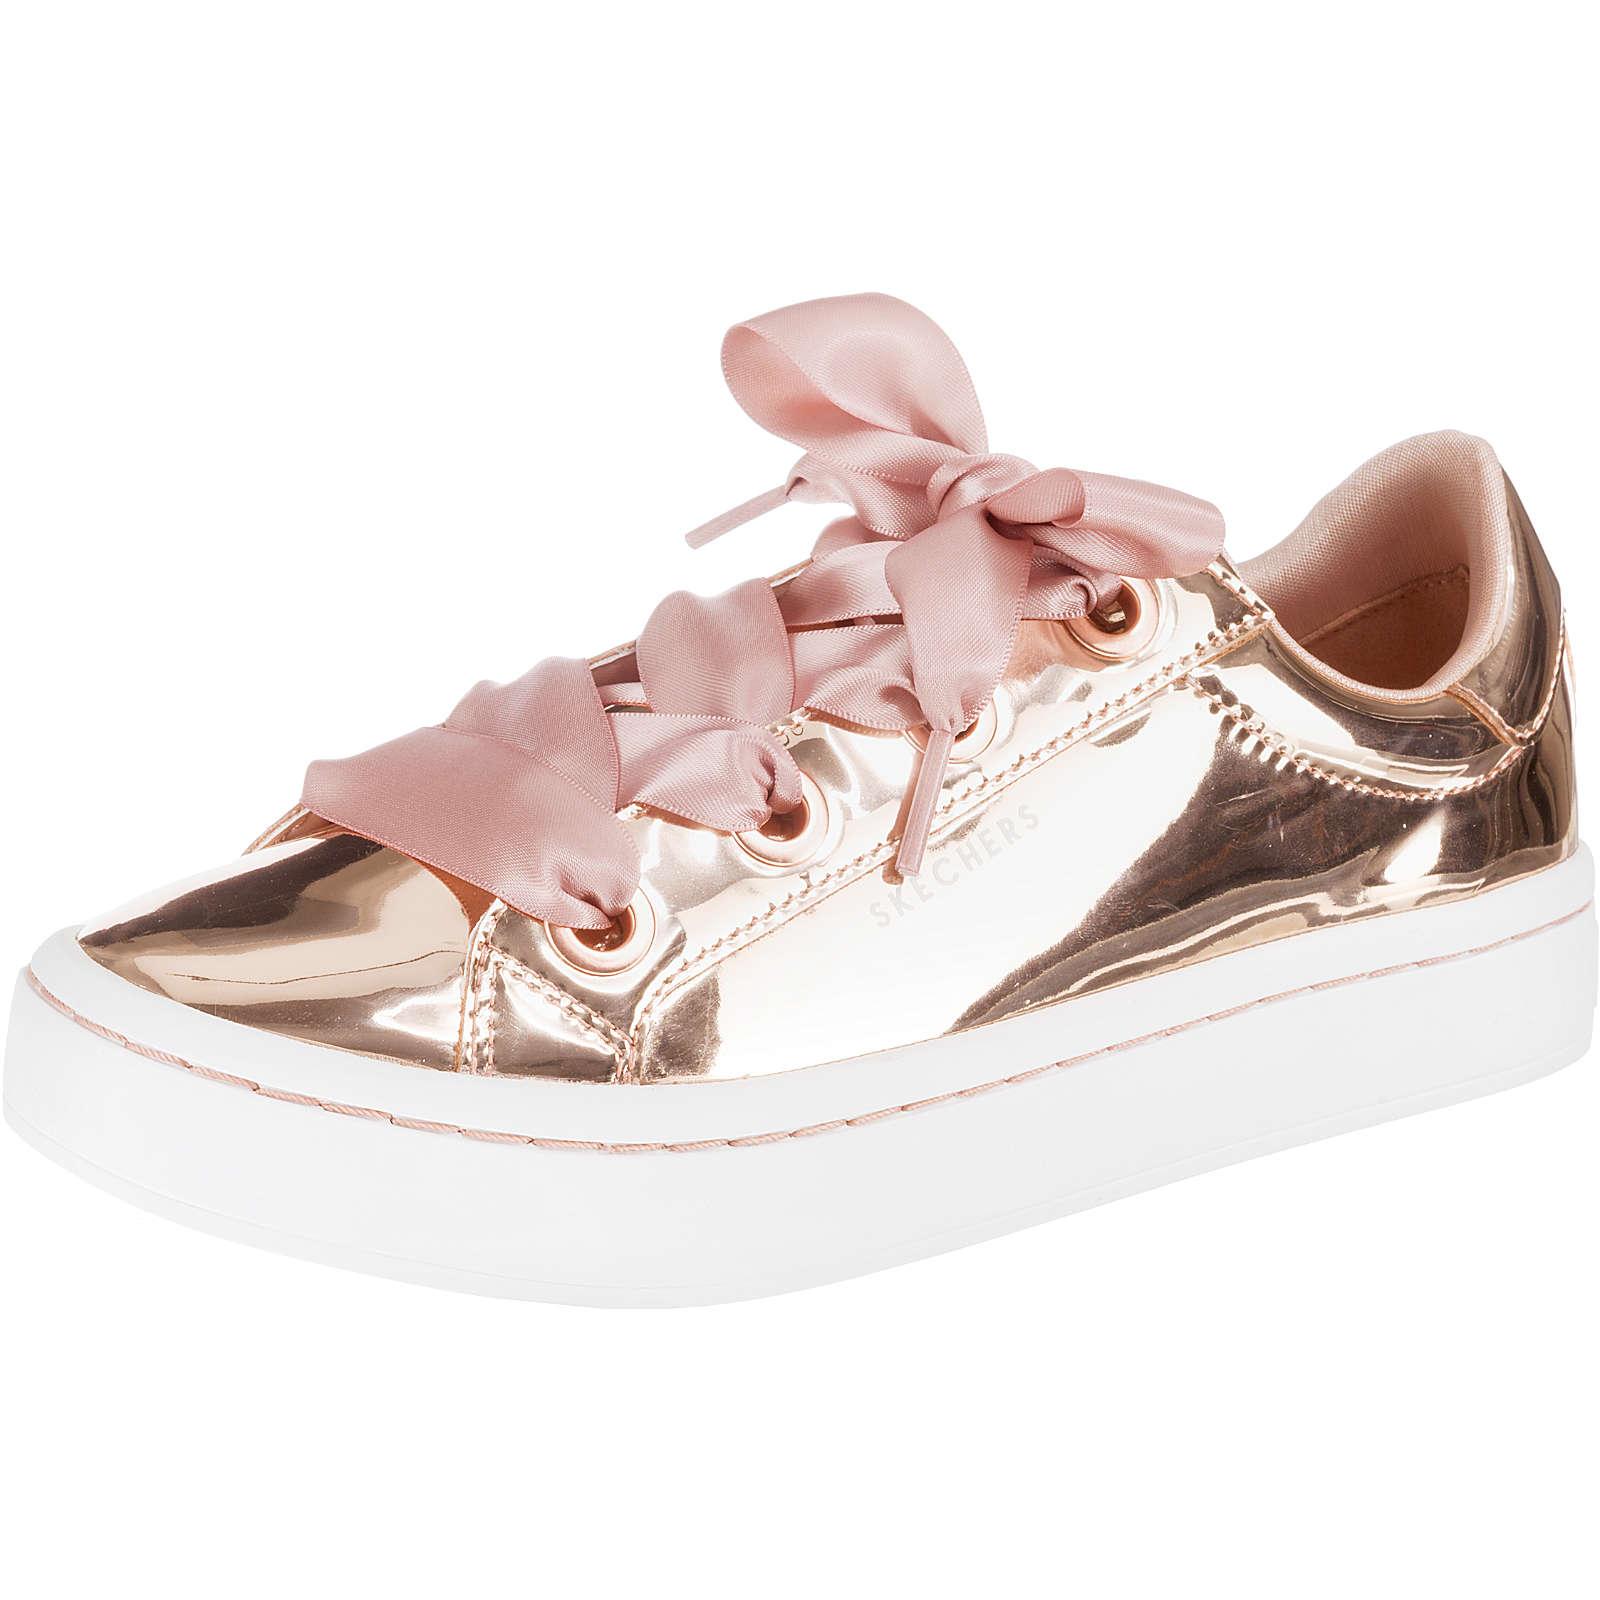 SKECHERS HI-LITES LIQUID BLING Sneakers Low rosegold Damen Gr. 36